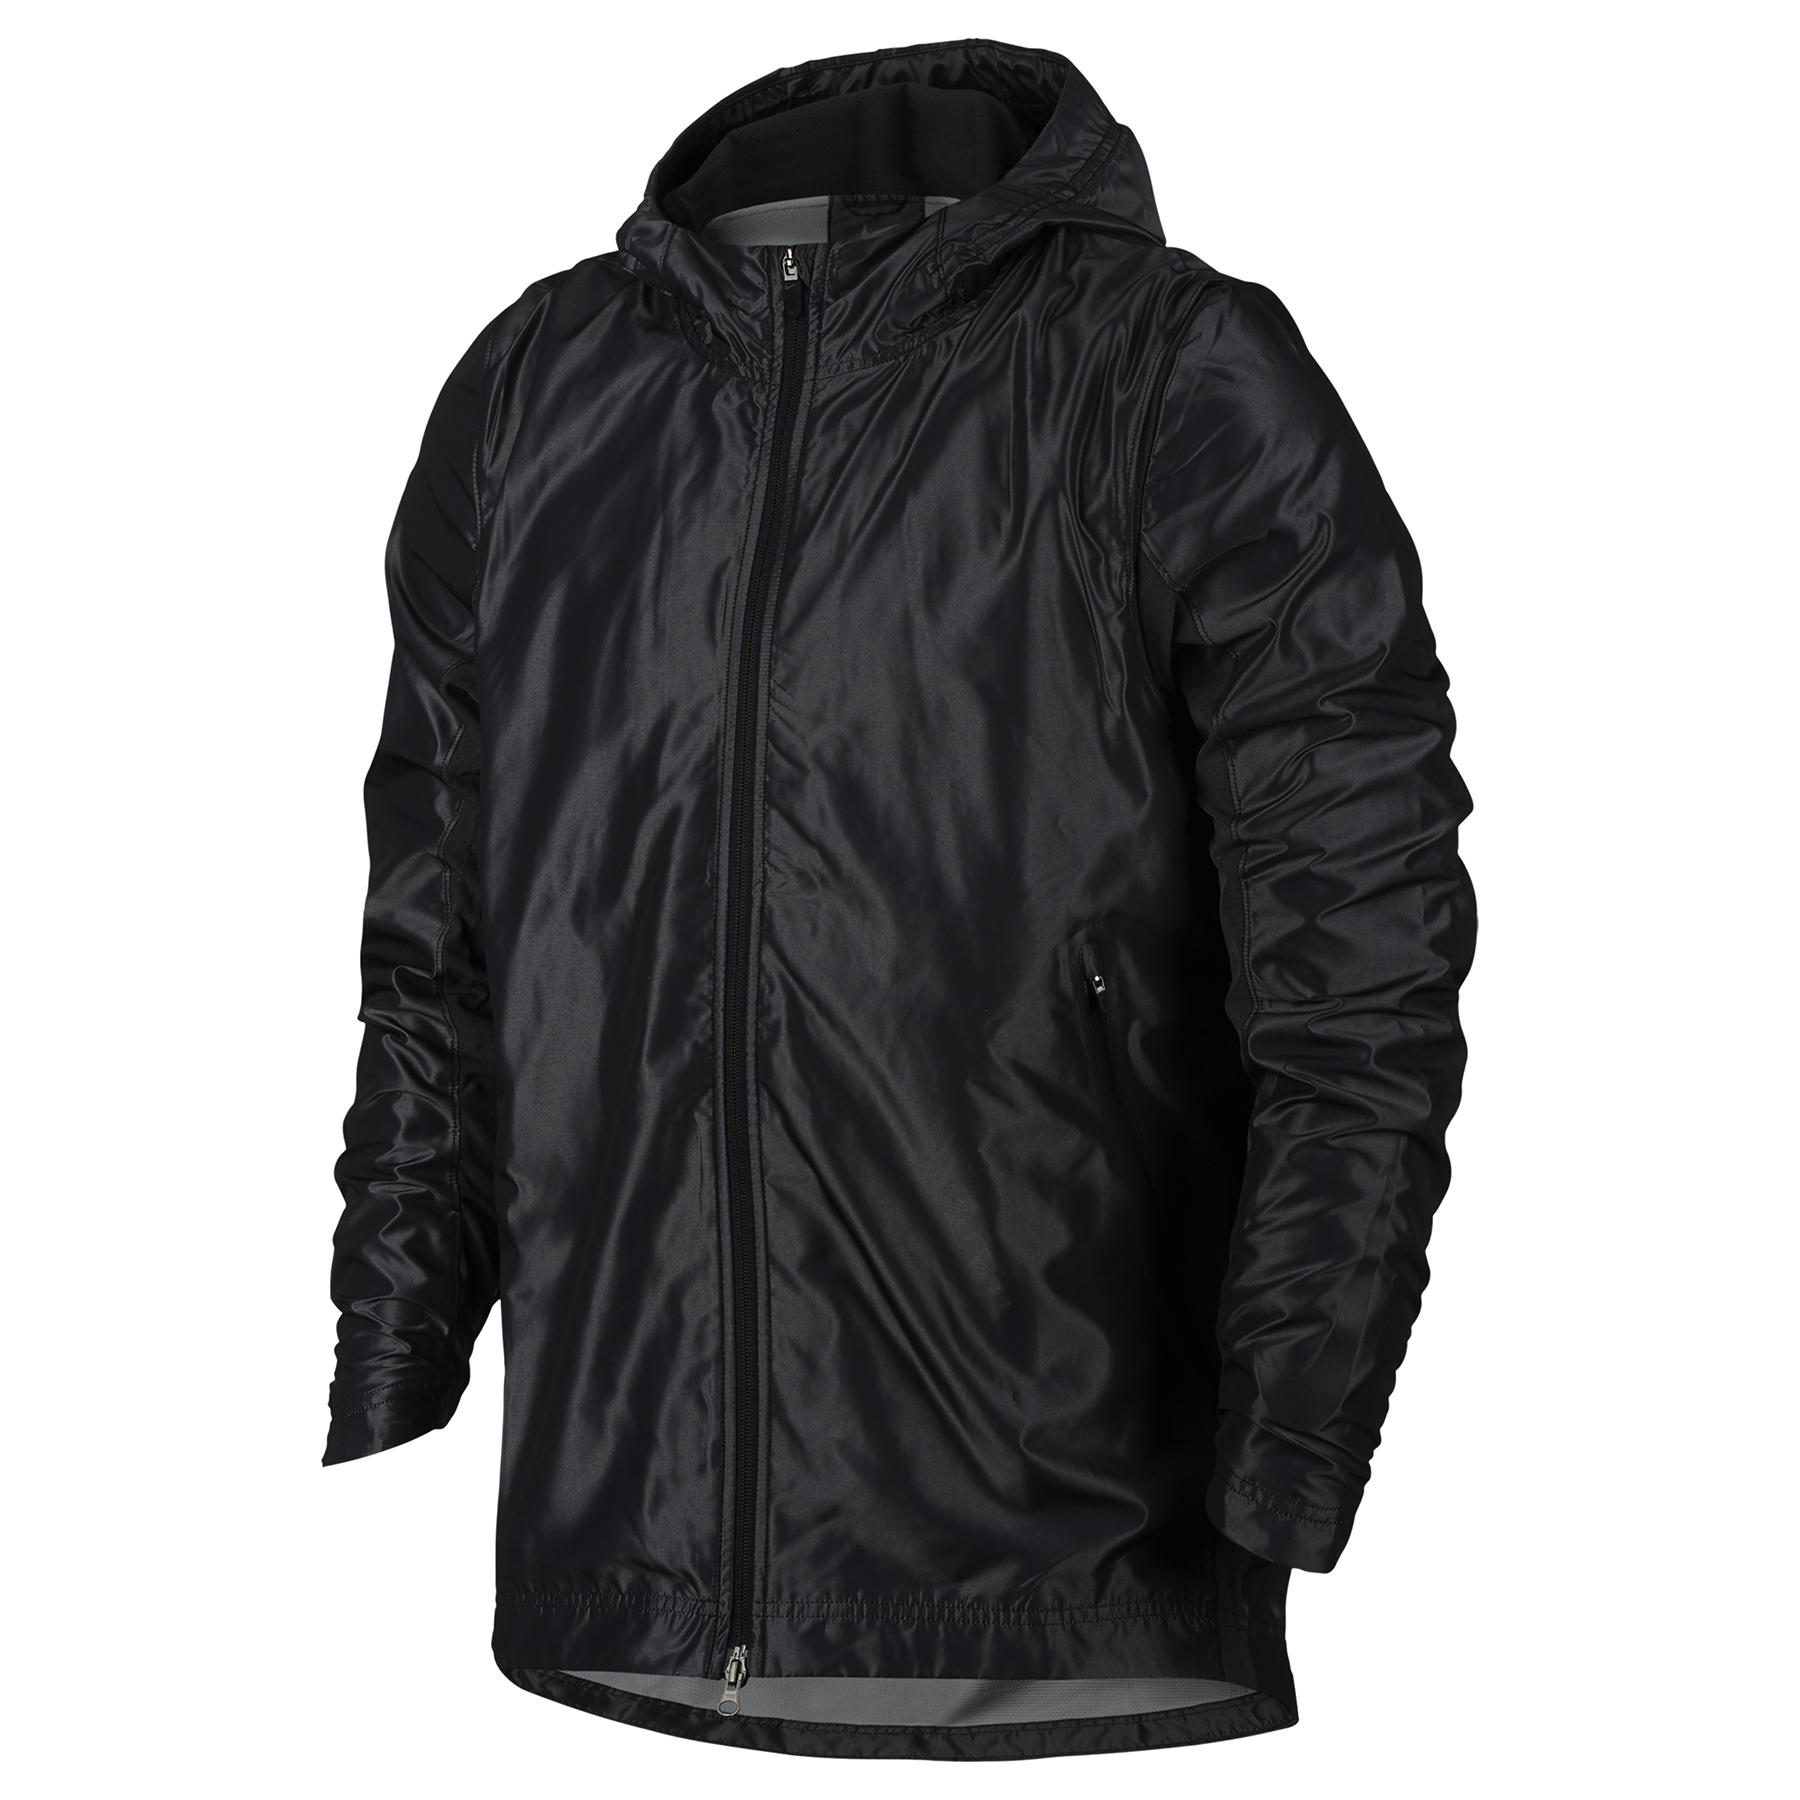 Nike Hyper Elite Basketball Jacket - Anthracite